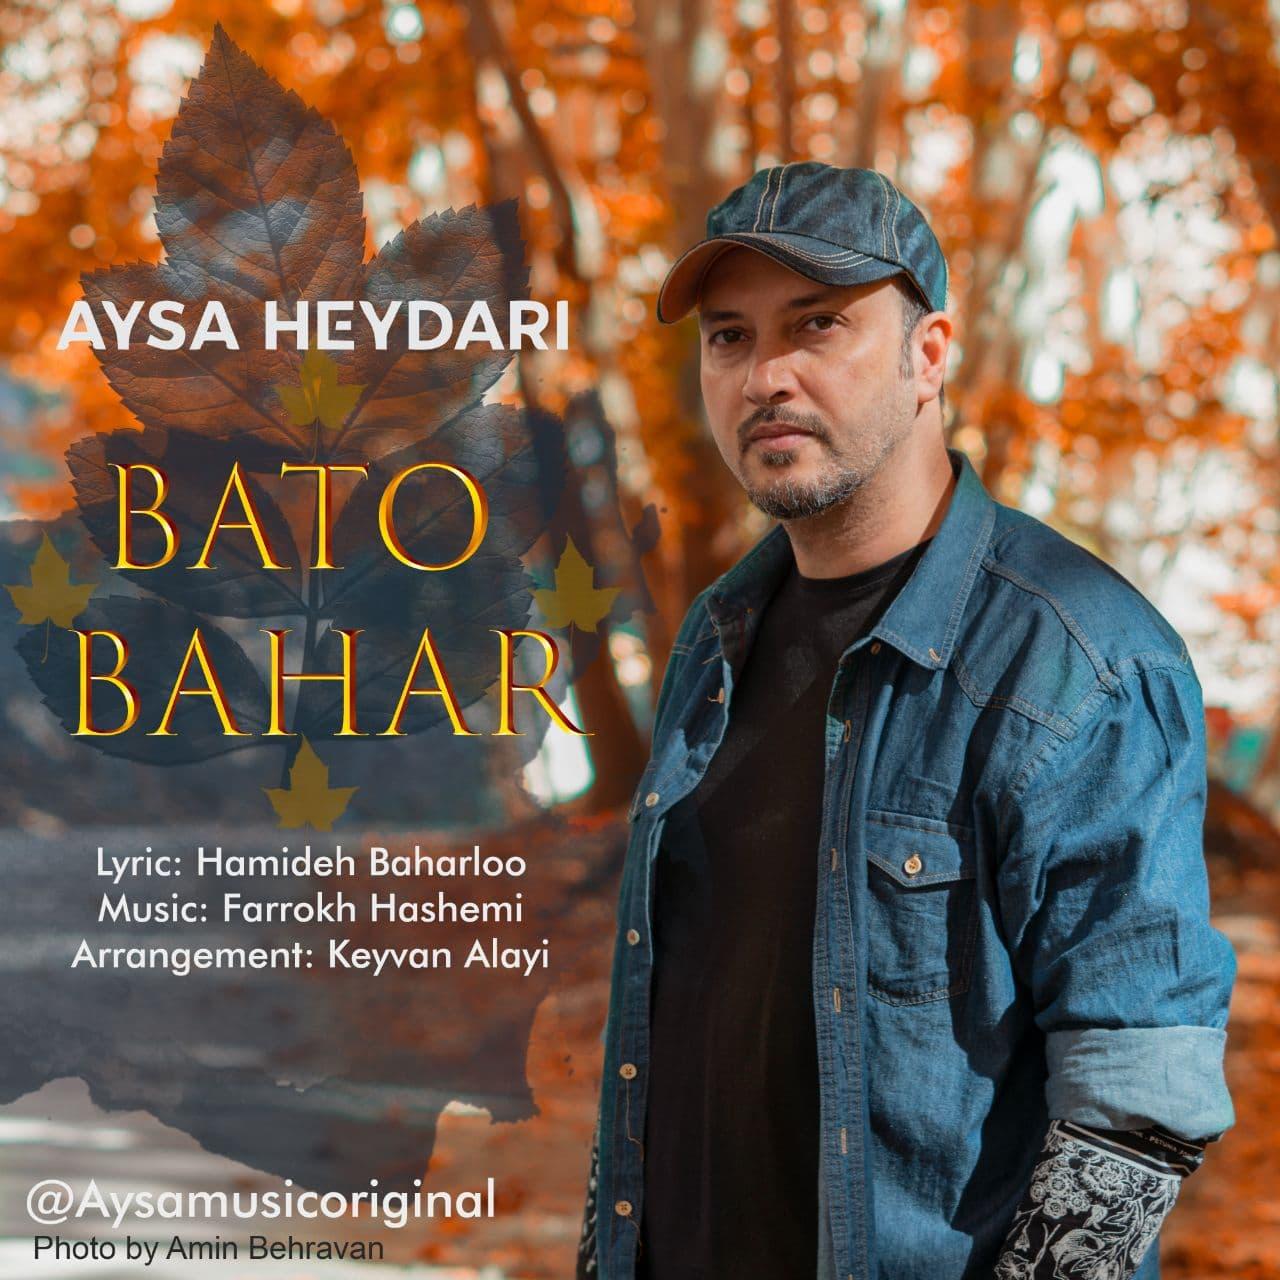 Aysa Heydari – Bato Bahar